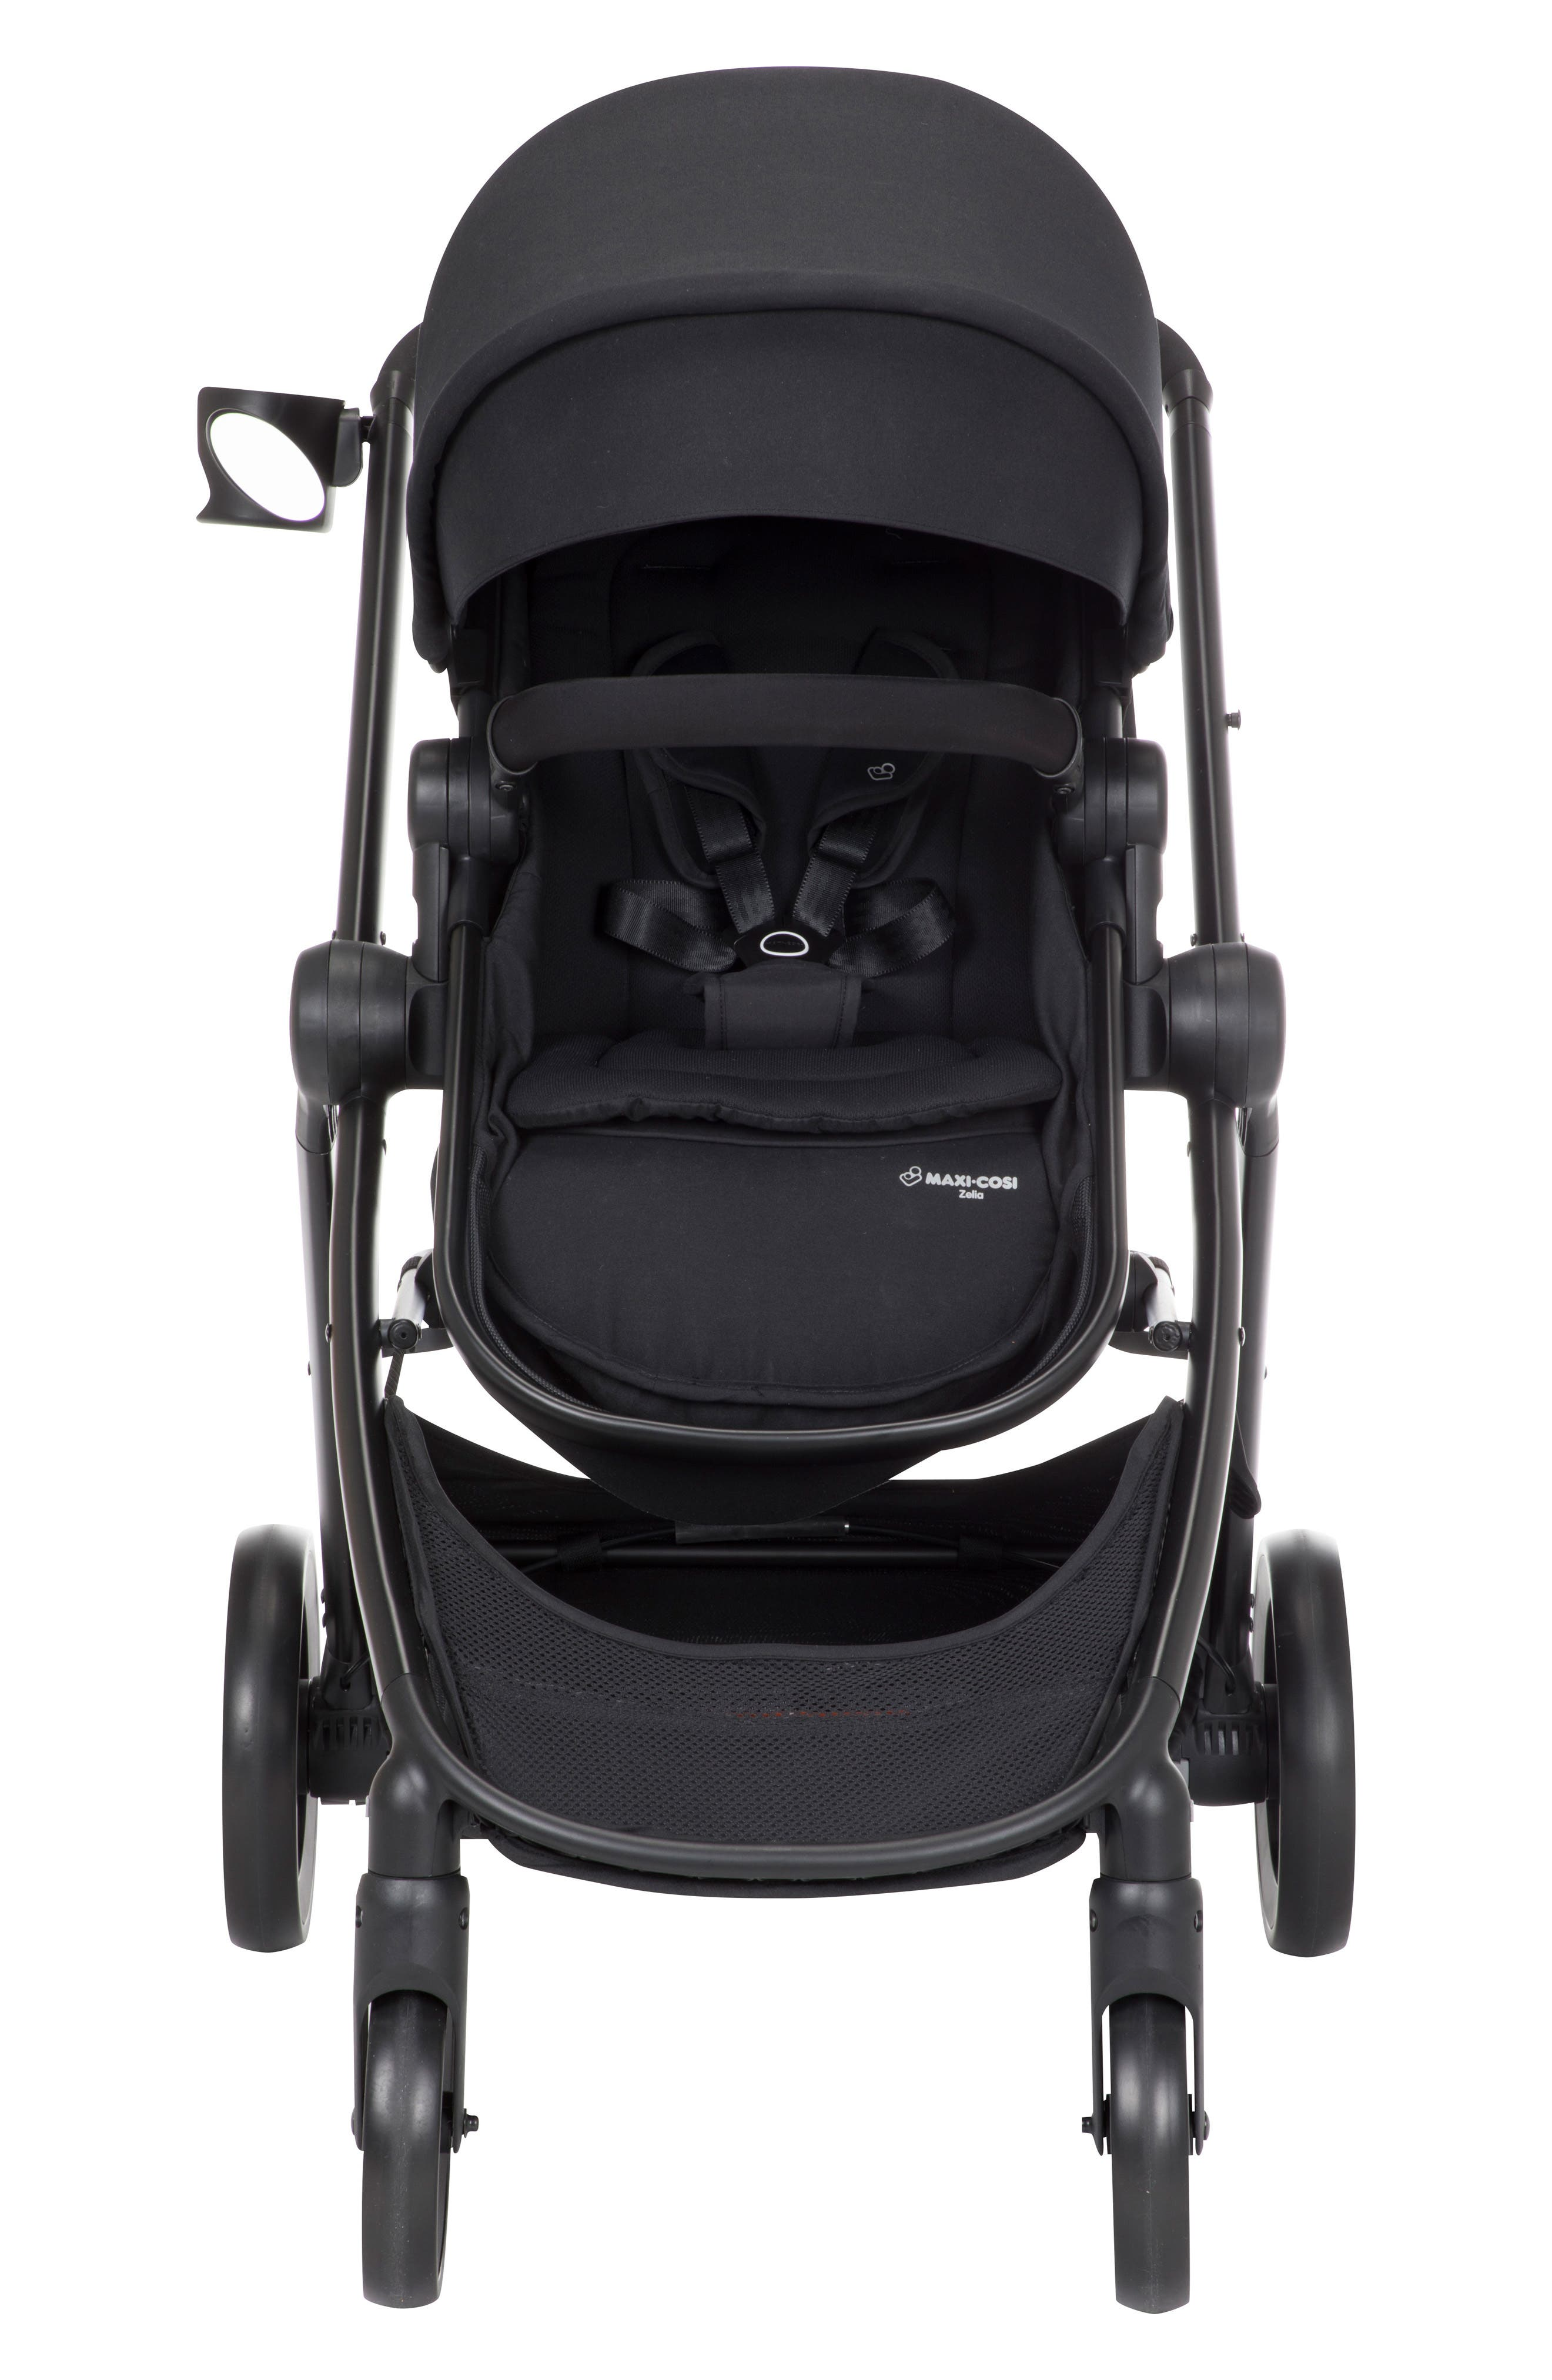 5-1 Mico 30 Infant Car Seat & Zelia Stroller Modular Travel System, Main, color, NIGHT BLACK